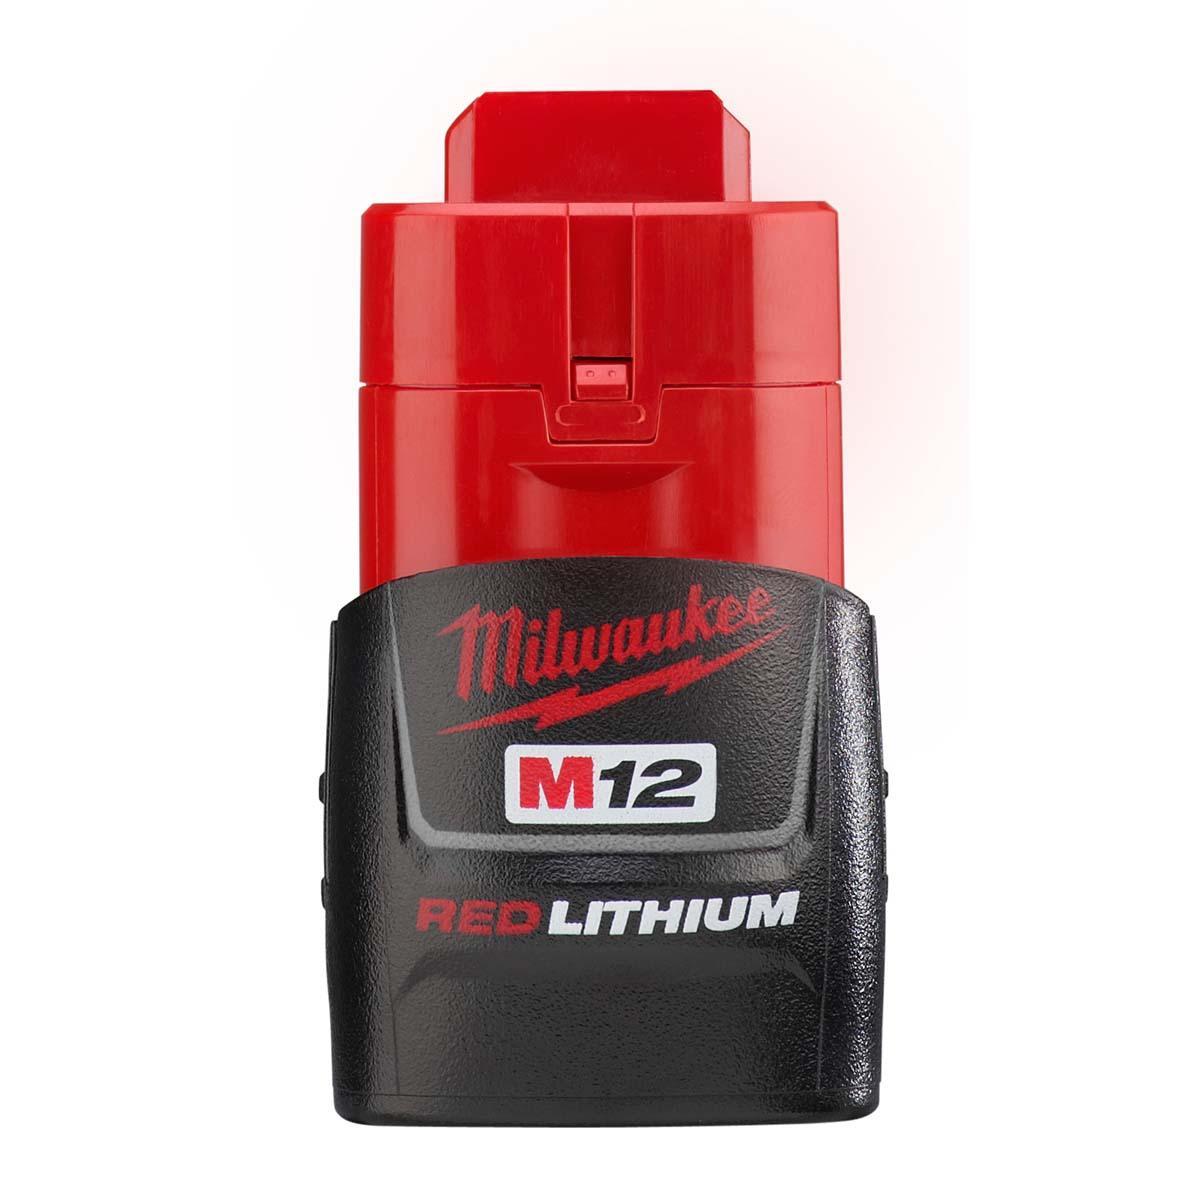 "M12â""¢ REDLITHIUMâ""¢ Battery"